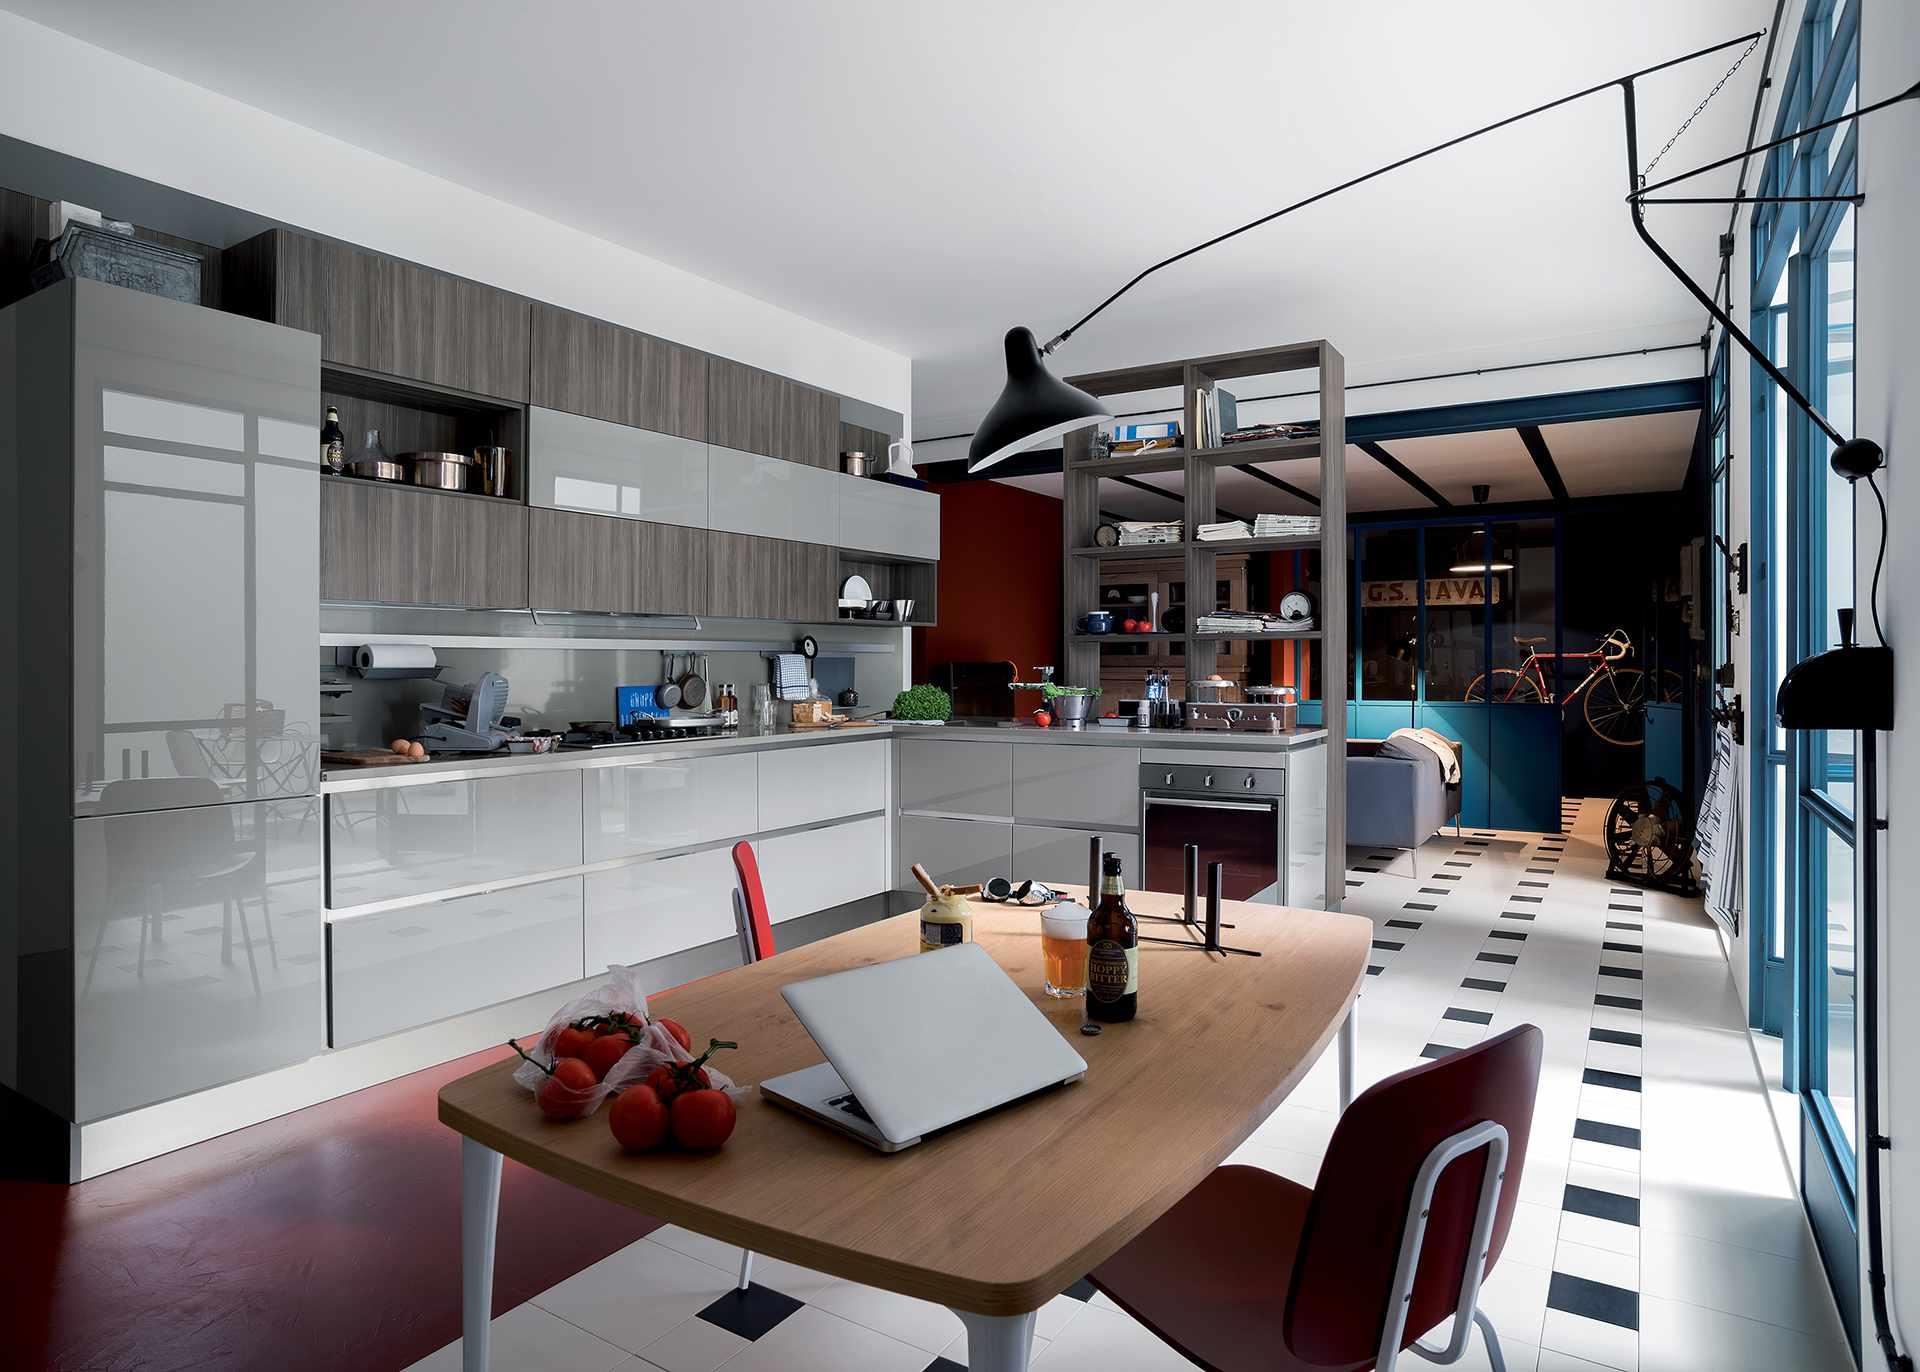 Veneta cucine dialogo orsolini - Cucine moderne italiane ...